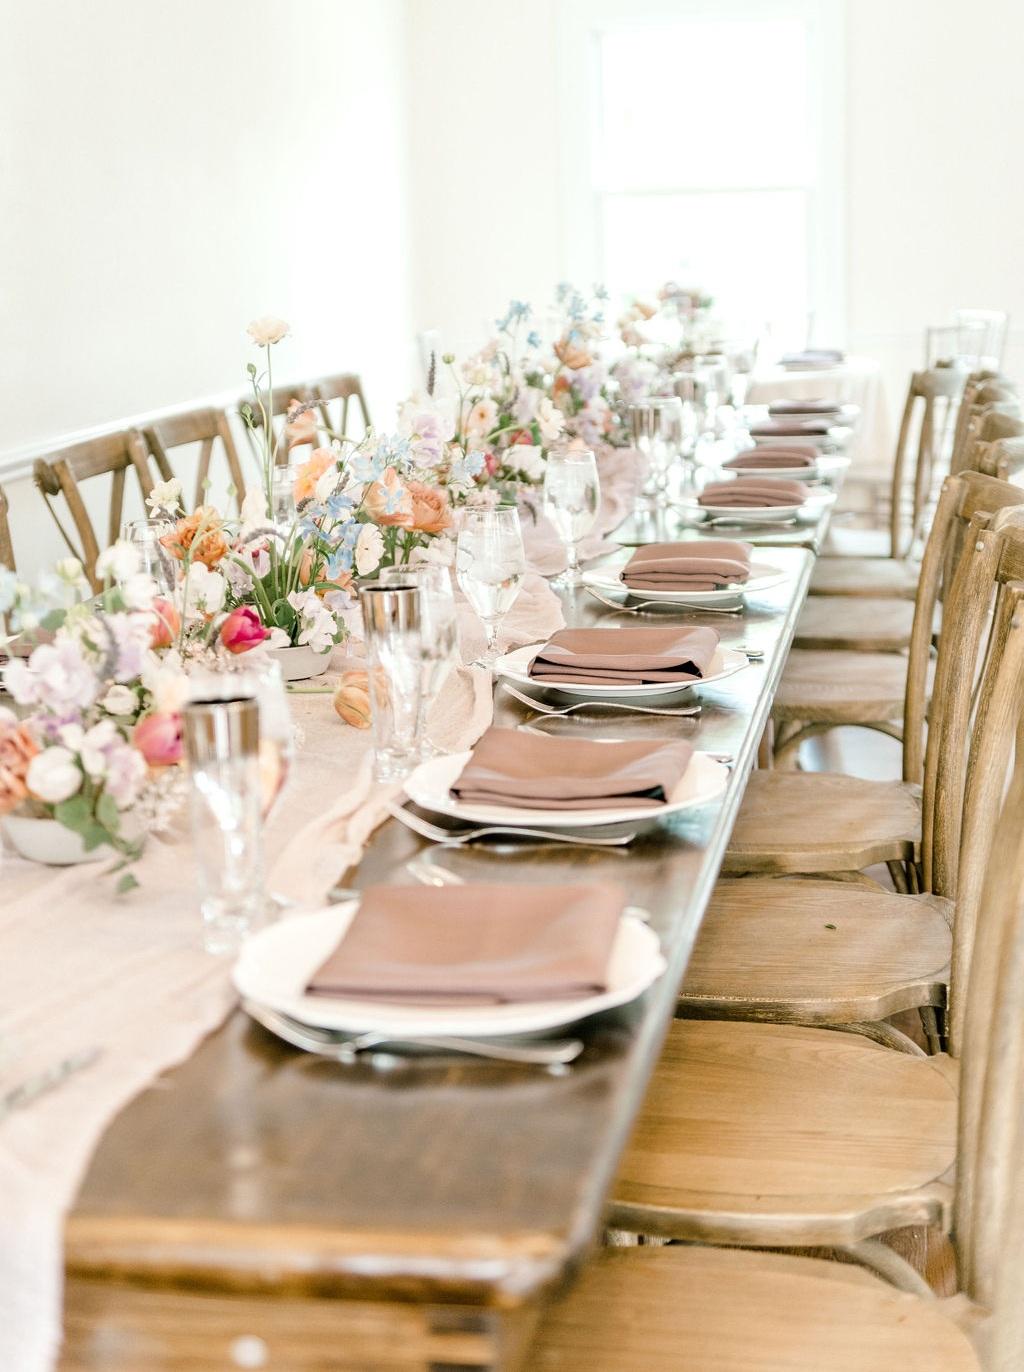 Dayton-event-planner-wedding-table-design-reception